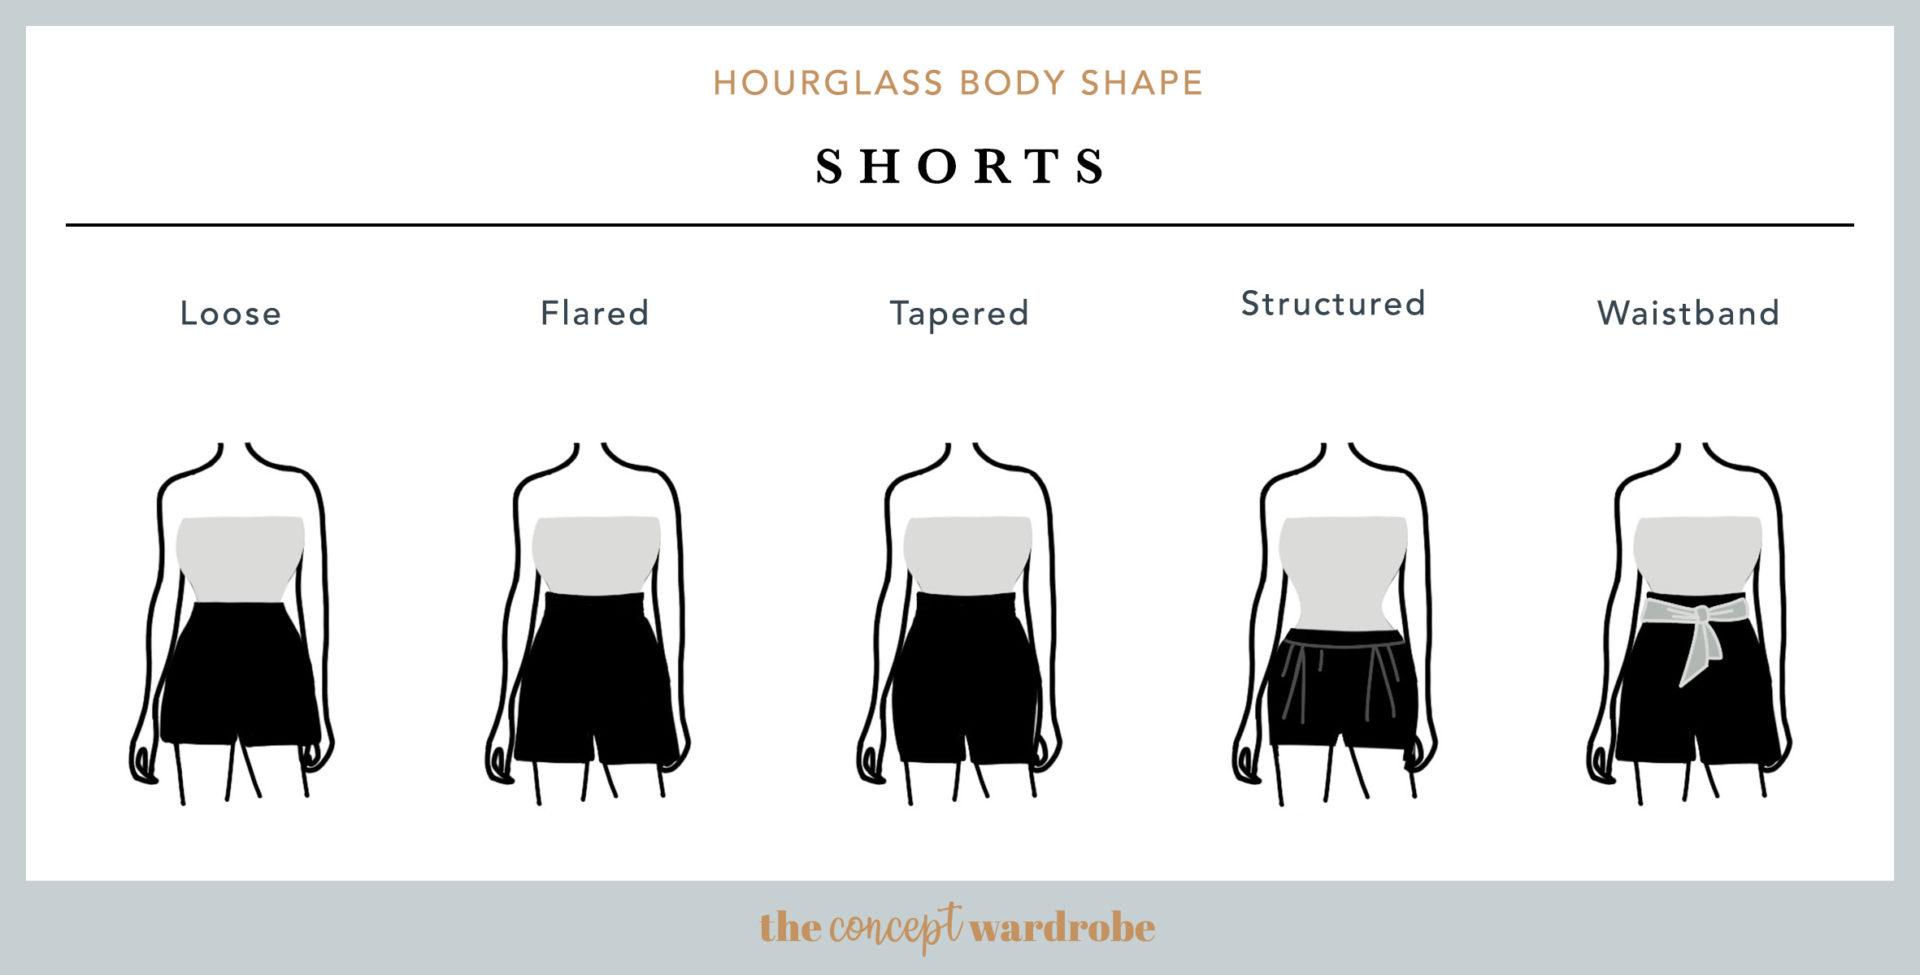 Hourglass Body Shape Shorts - the concept wardrobe